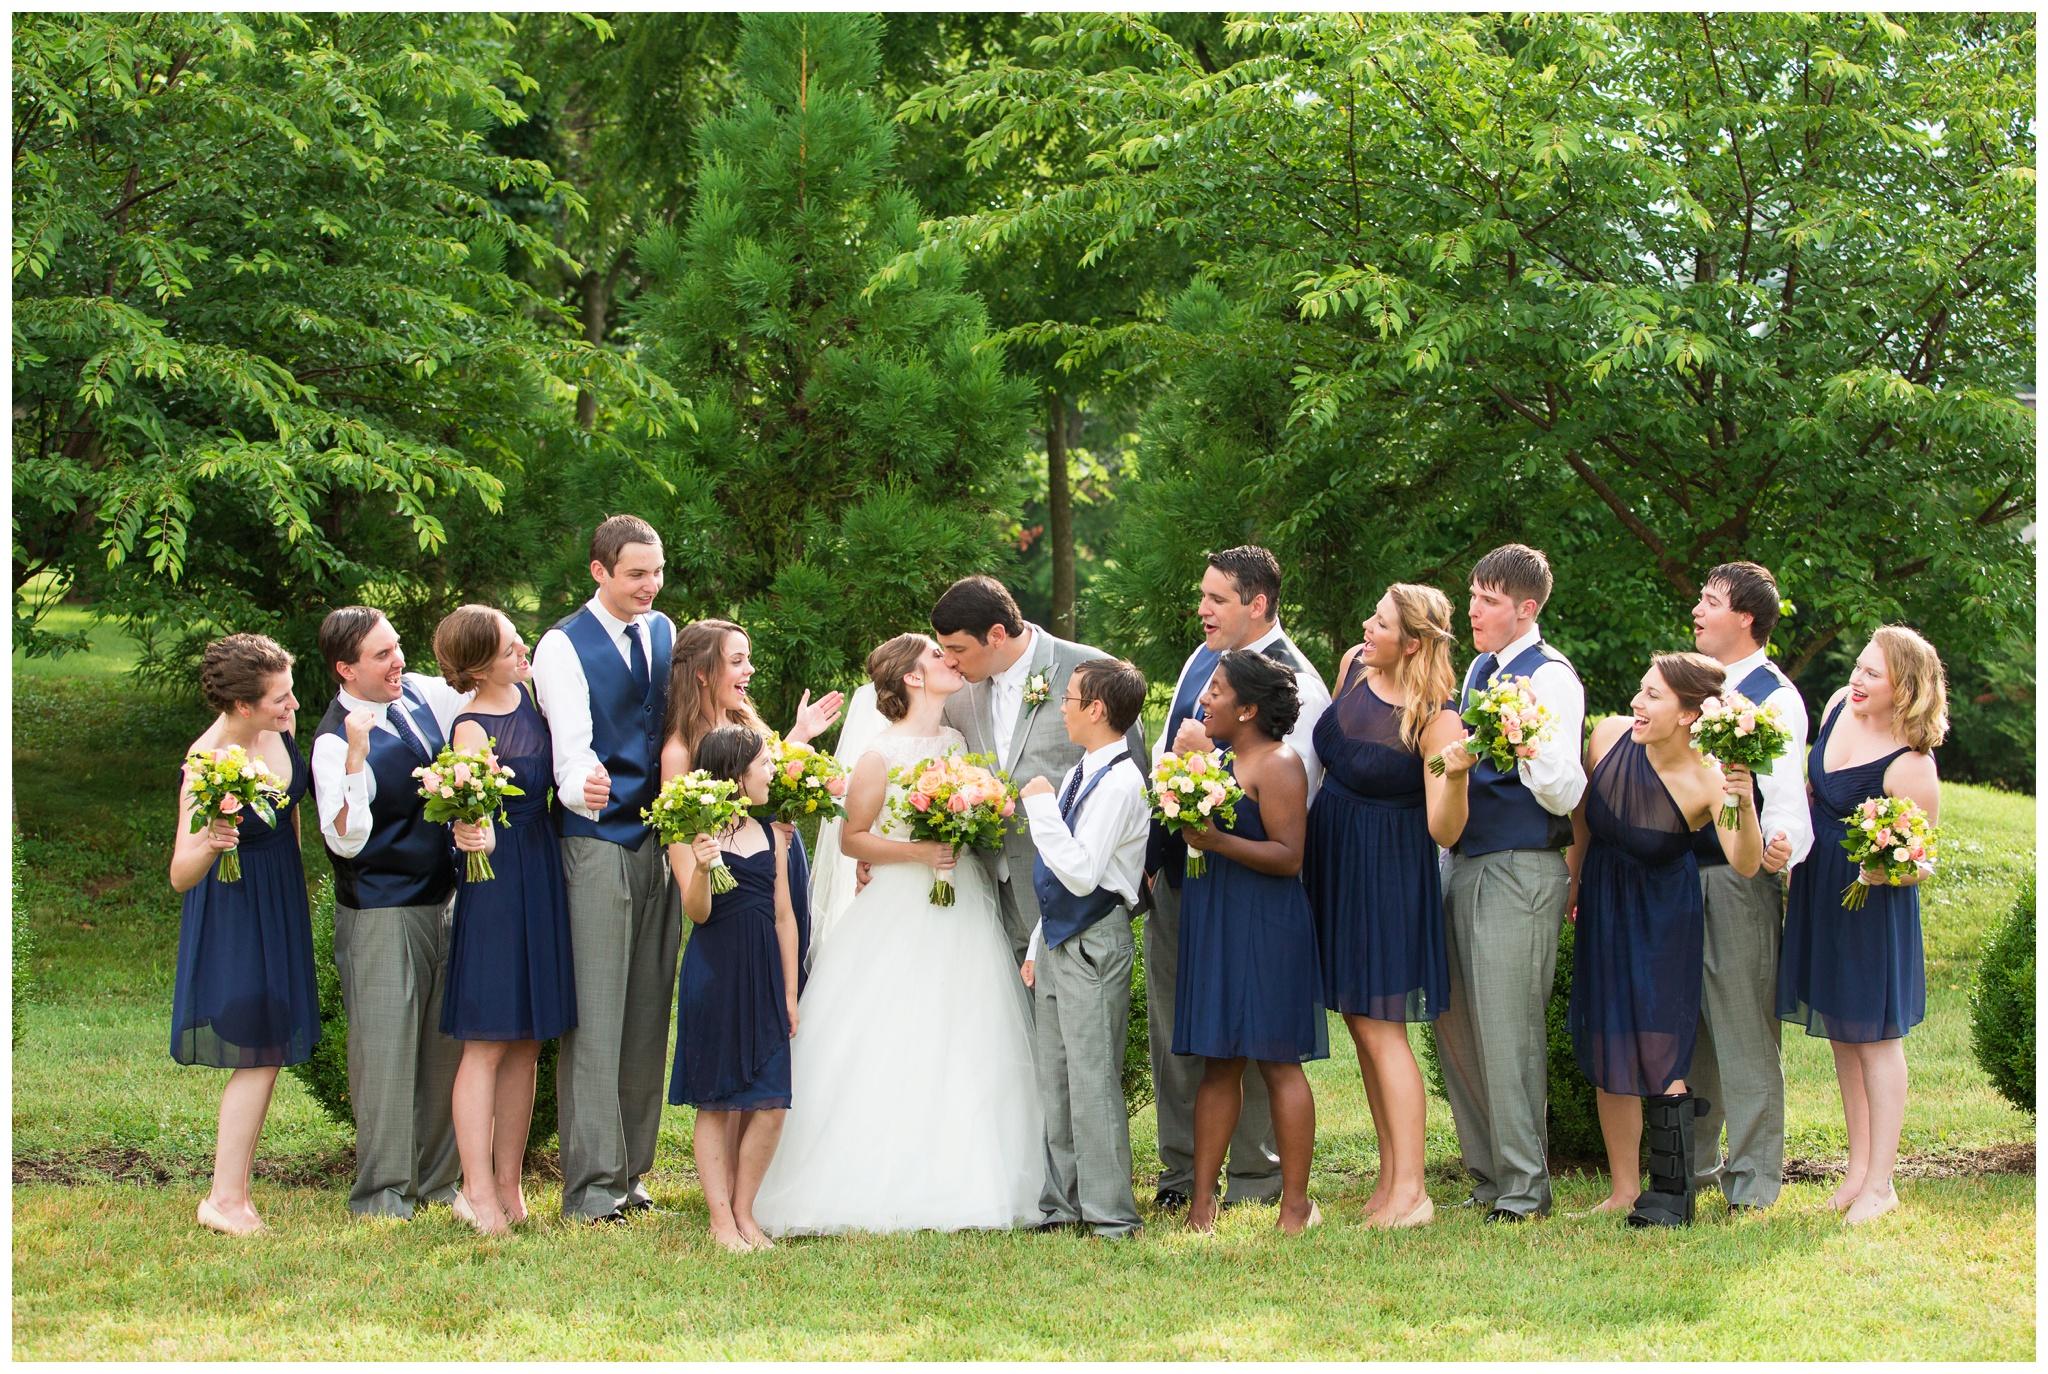 Brian-and-Megan_the-herrintons-va-wedding-photography-130_STOMPED1.jpg